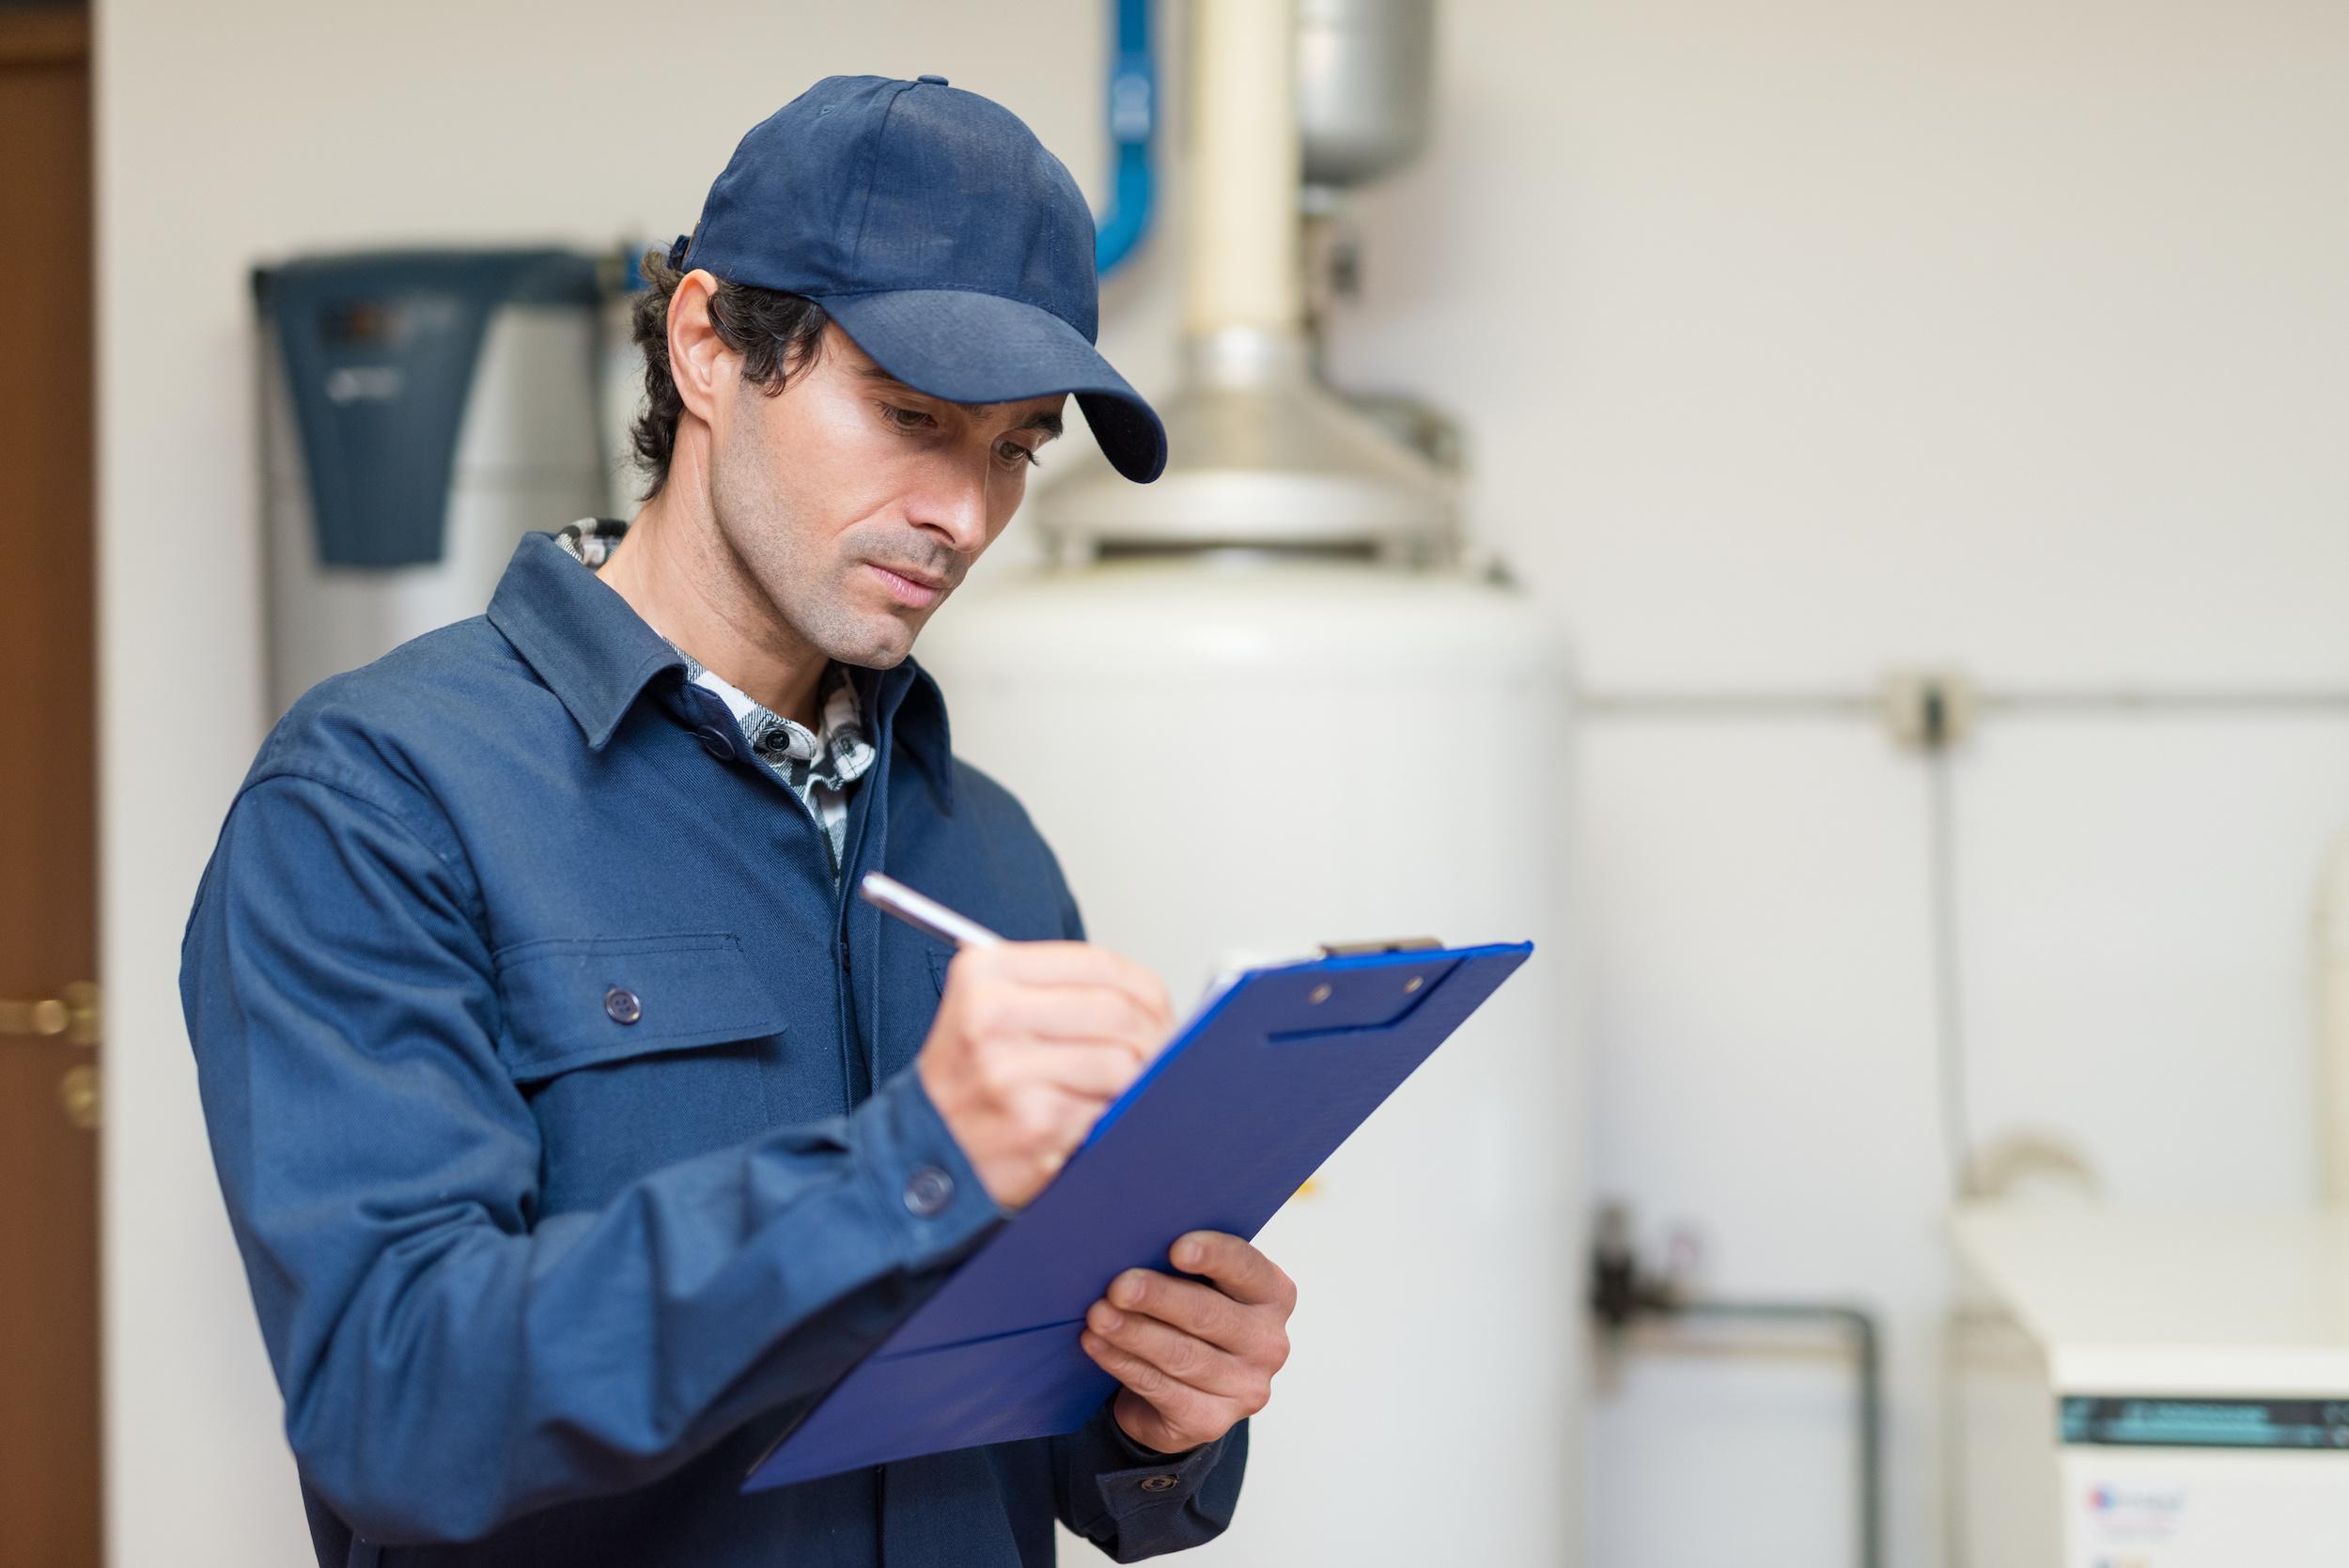 technician checking for radon gas in a home